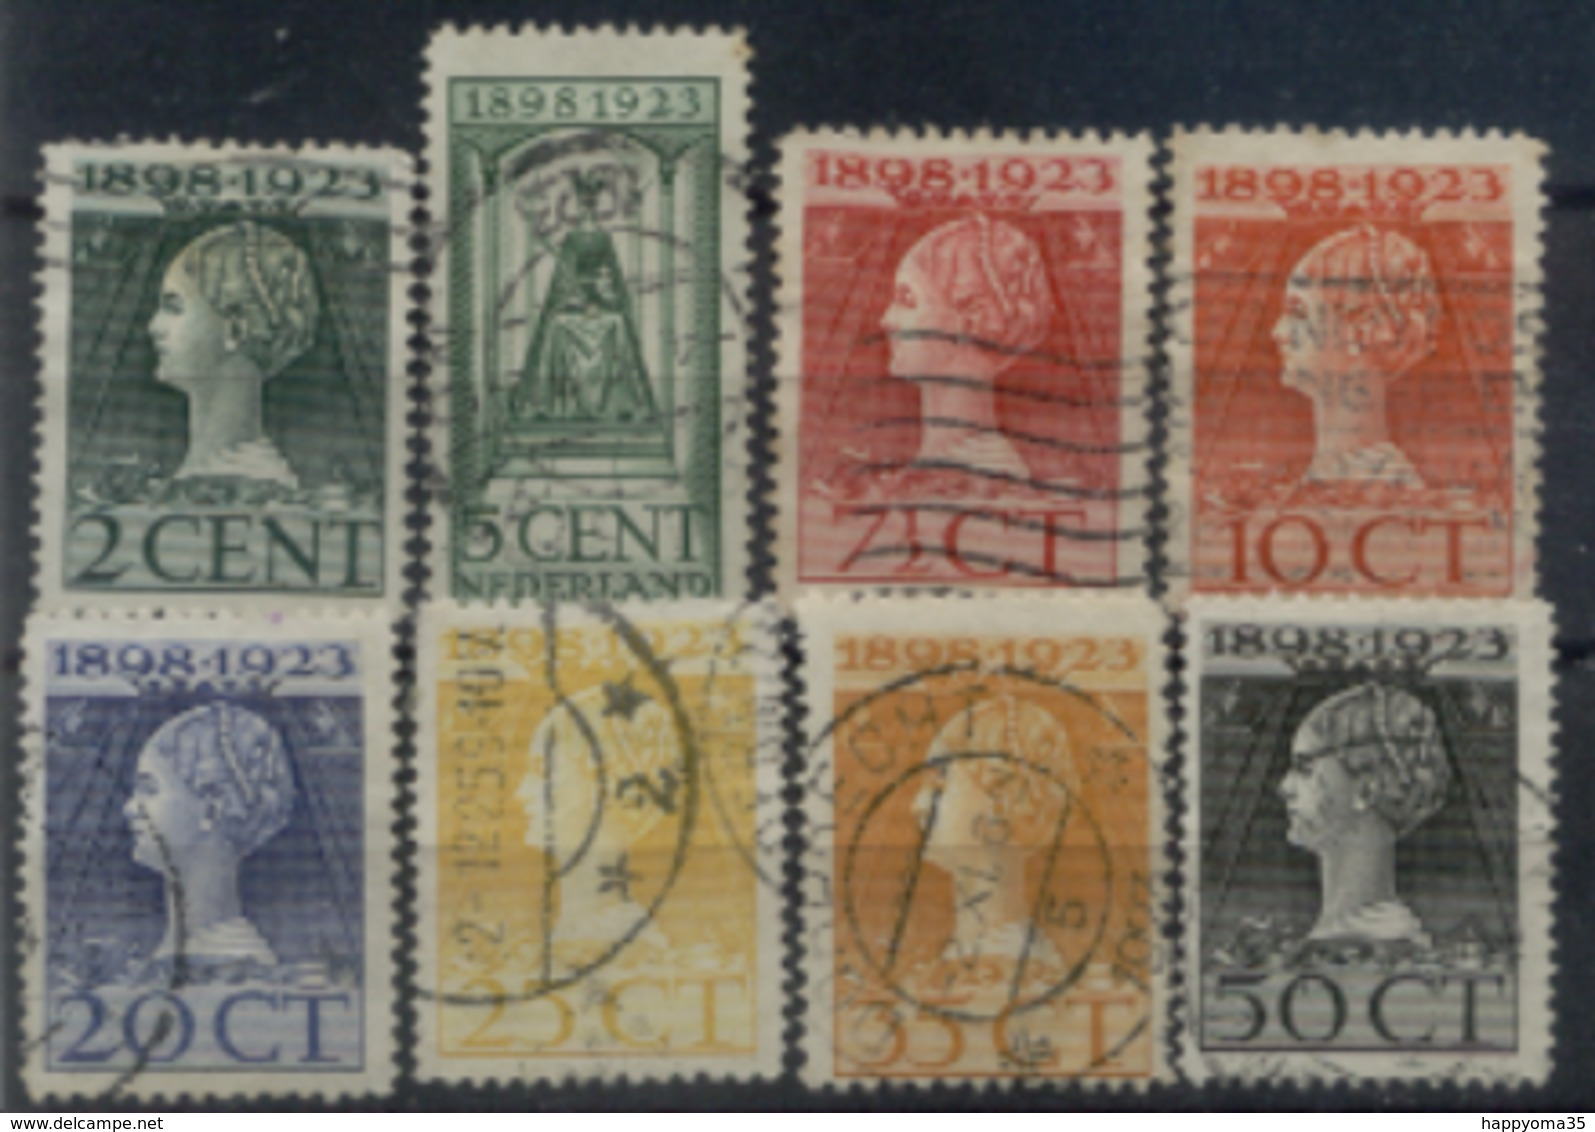 Niederlande 121 - 128 Mix Set Stamps Of Netherlands Pays-Bas Los Países Bajos Nederland Small Selection Used 6970 - 1891-1948 (Wilhelmine)